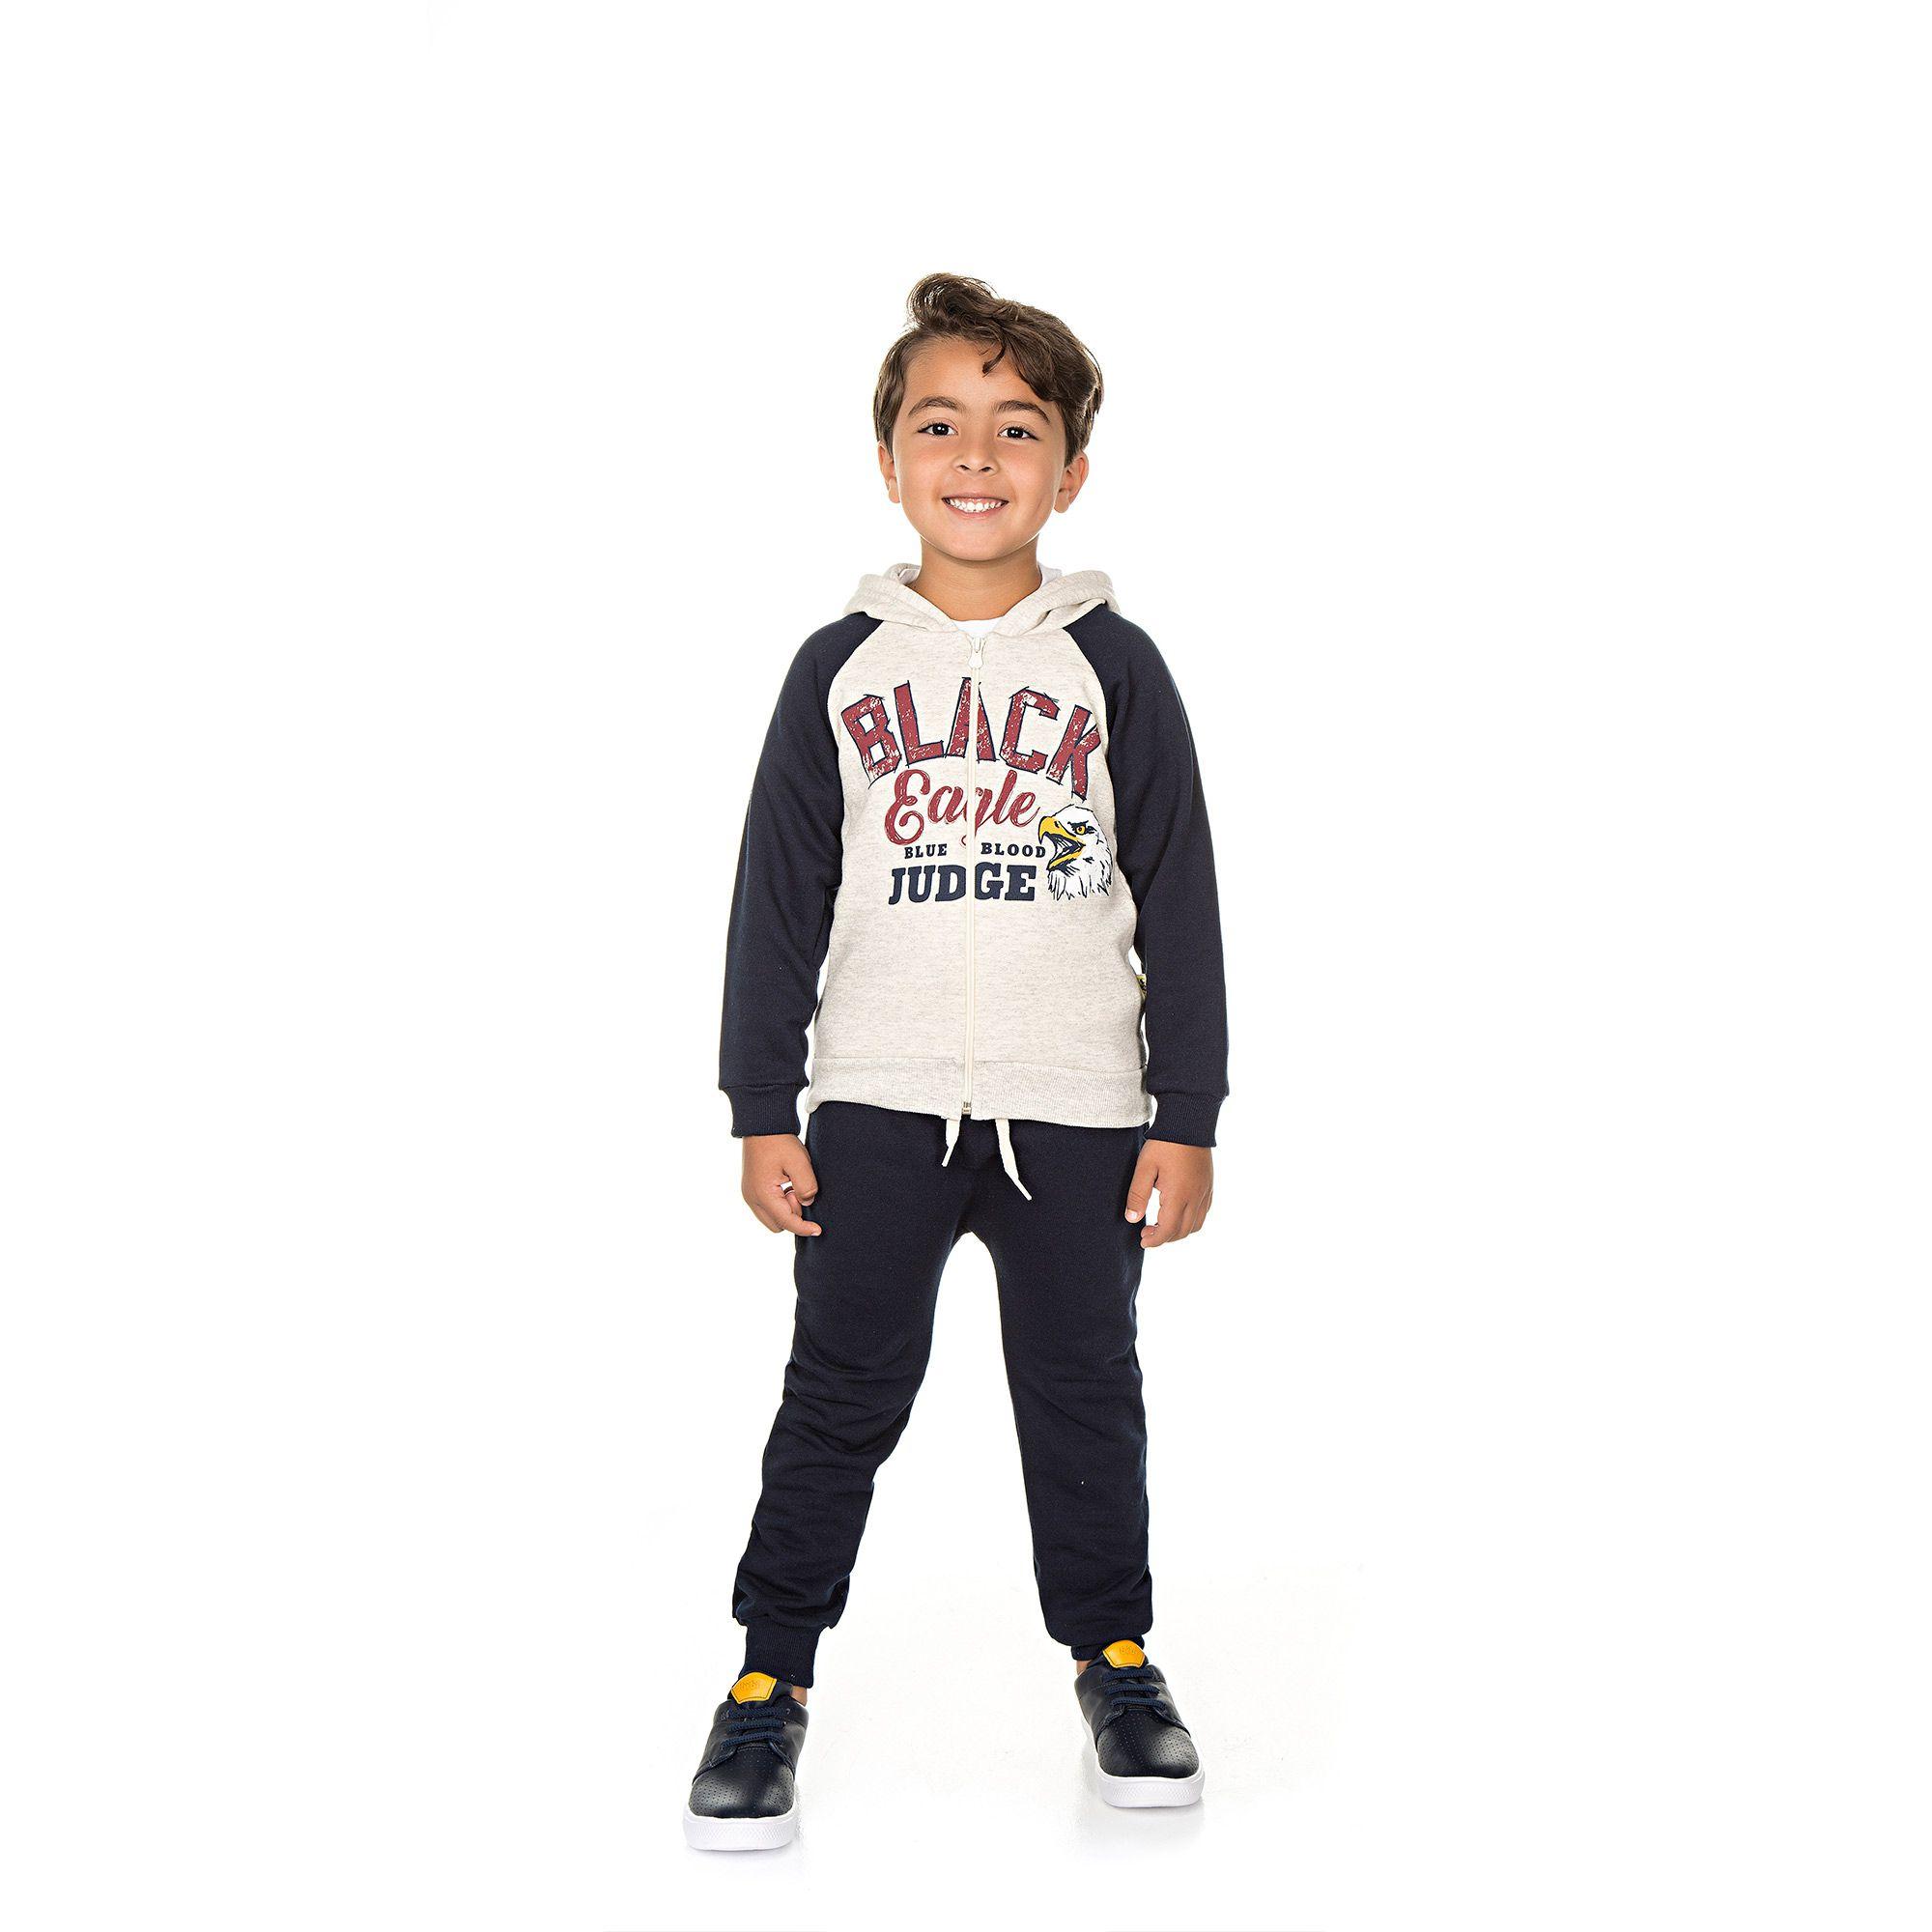 Conjunto Infantil Masculino  - Ref 5017 - Mescla/Marinho